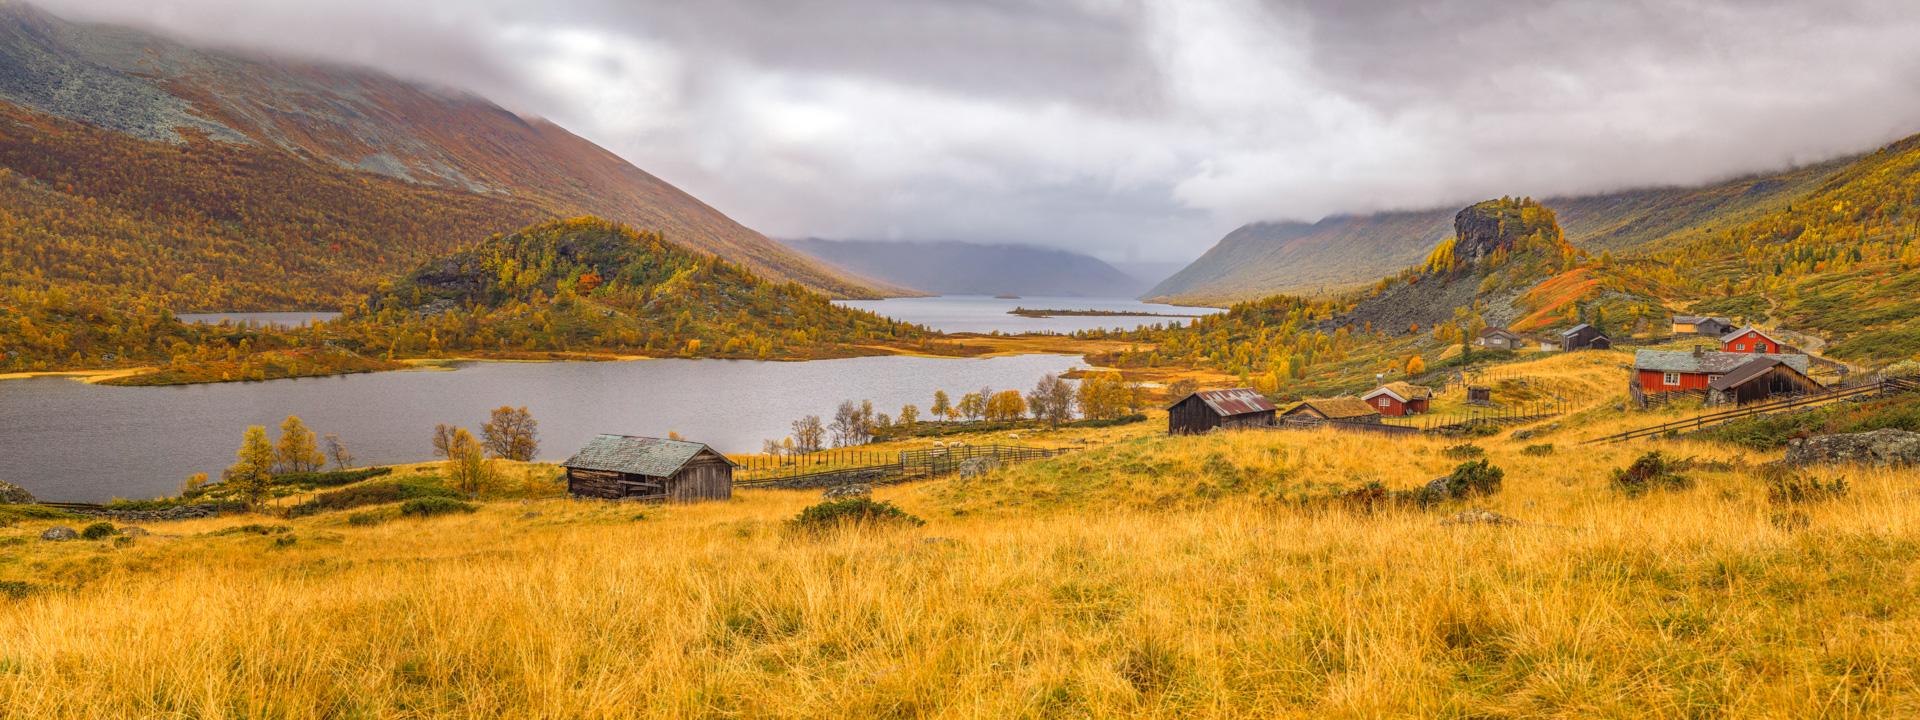 Einar Anbjørn Hansen: When the Autumn Tells You a Story (Strø)